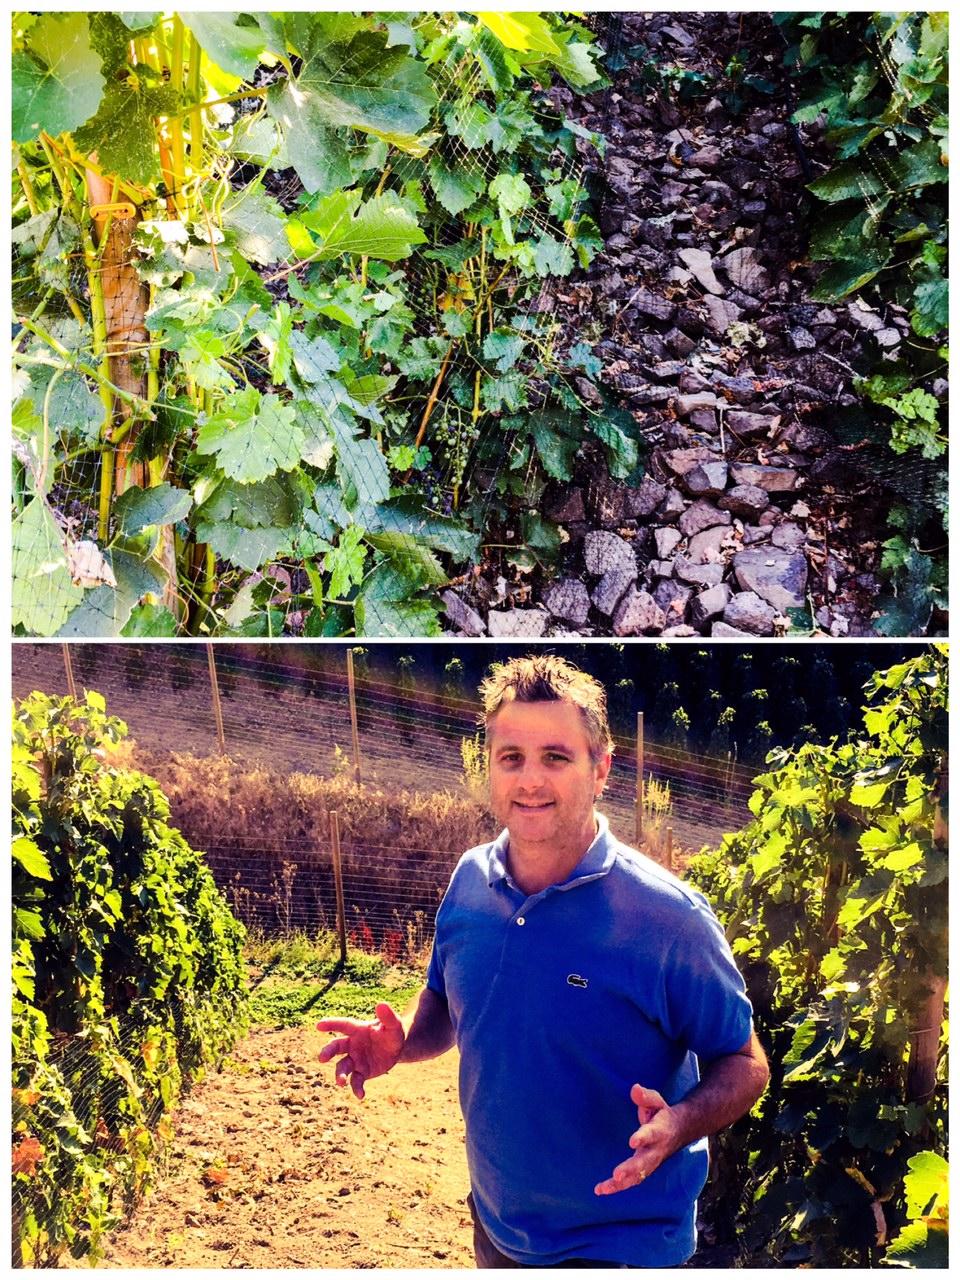 Eminent vigneron, Christophe Baron, has produced another mesmerizing Hors Categorie Syrah.